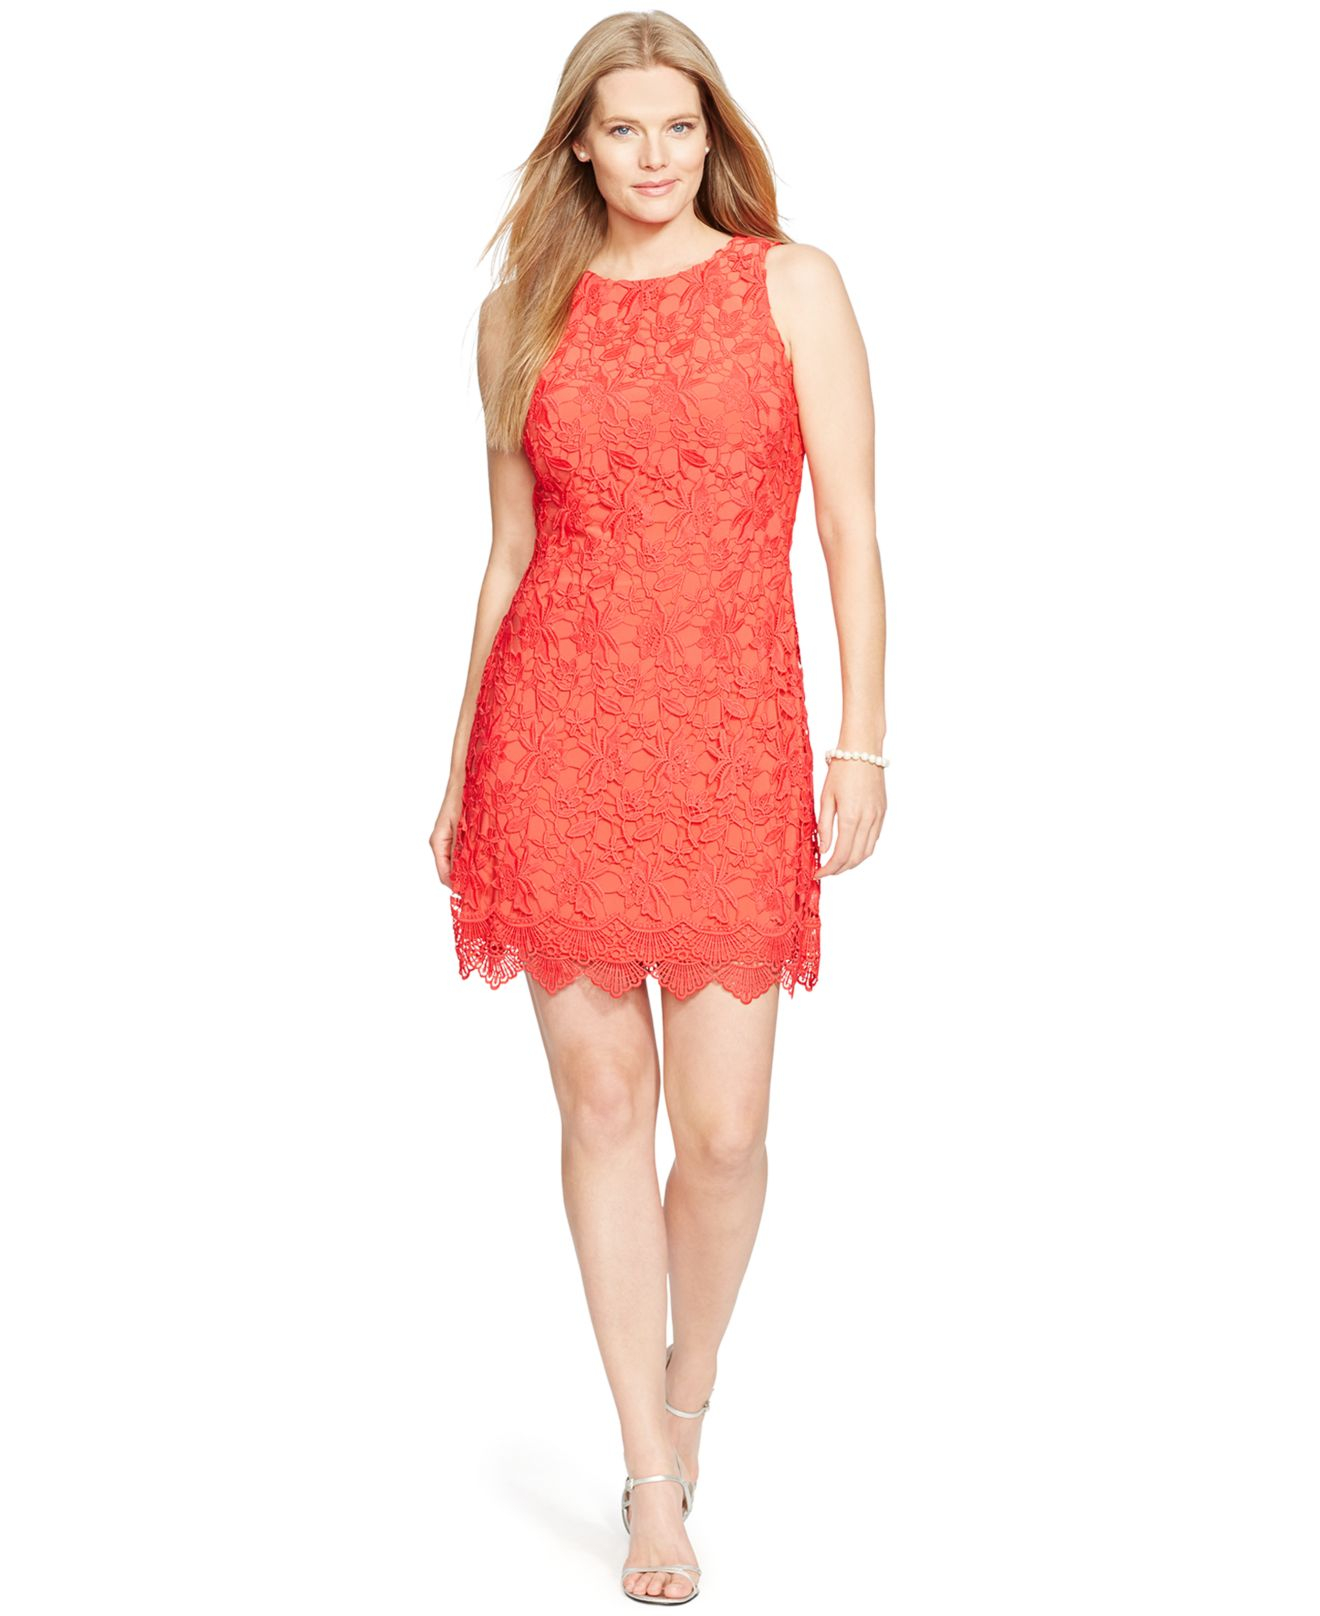 2c78be9c9d73 Lauren by Ralph Lauren Plus Size Sleeveless Lace Dress in Red - Lyst